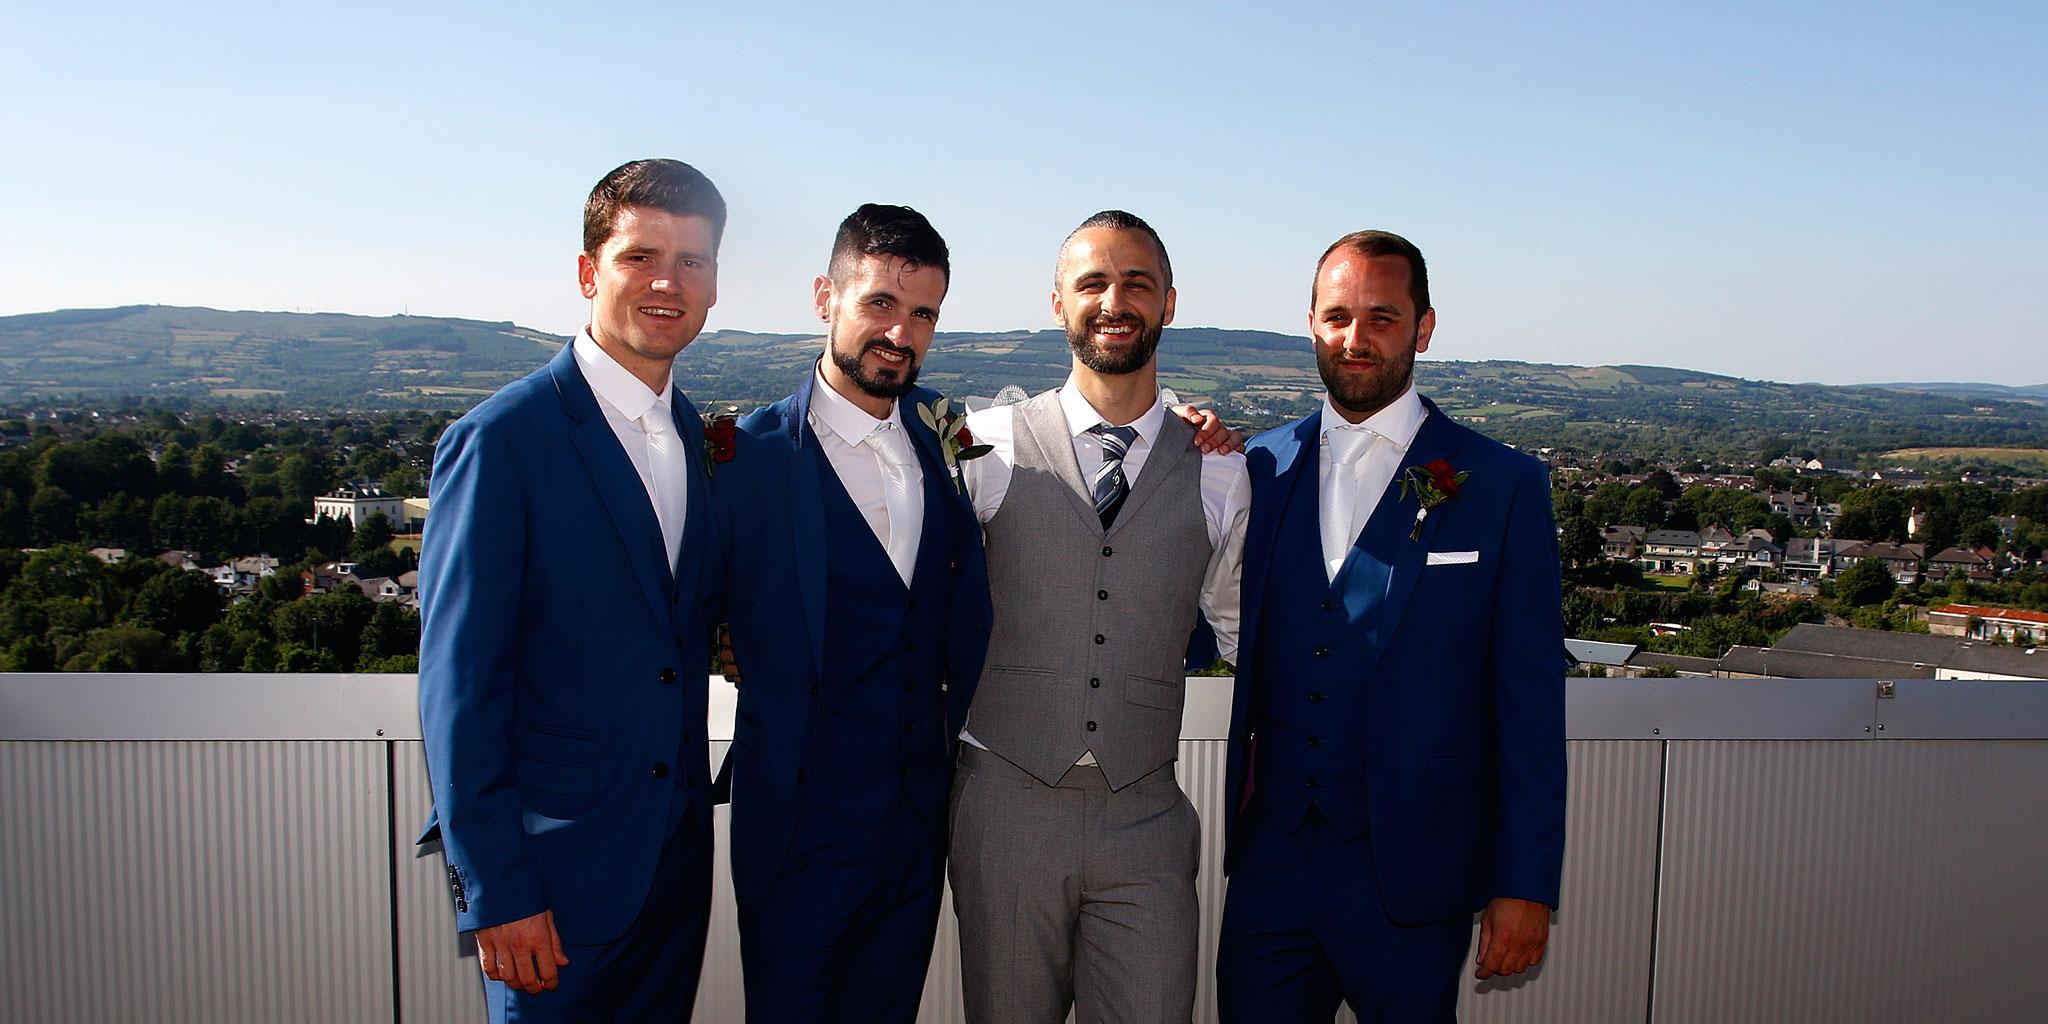 weddings-clayton-limerick